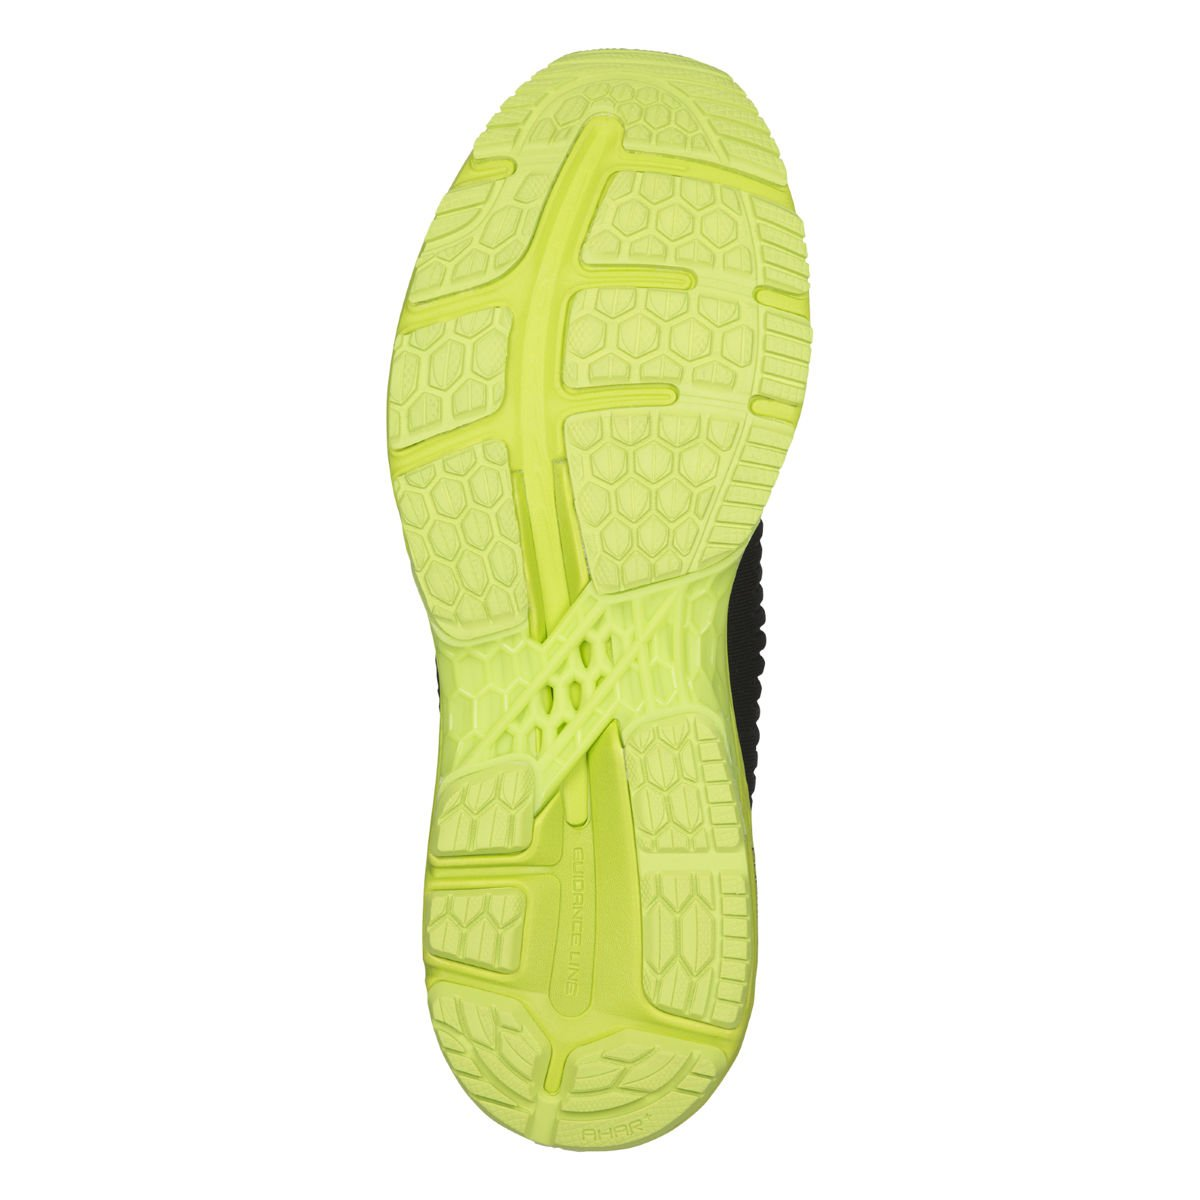 Buty do biegania Asics Gel Kayano 25 1011A019 001 | sklep SK